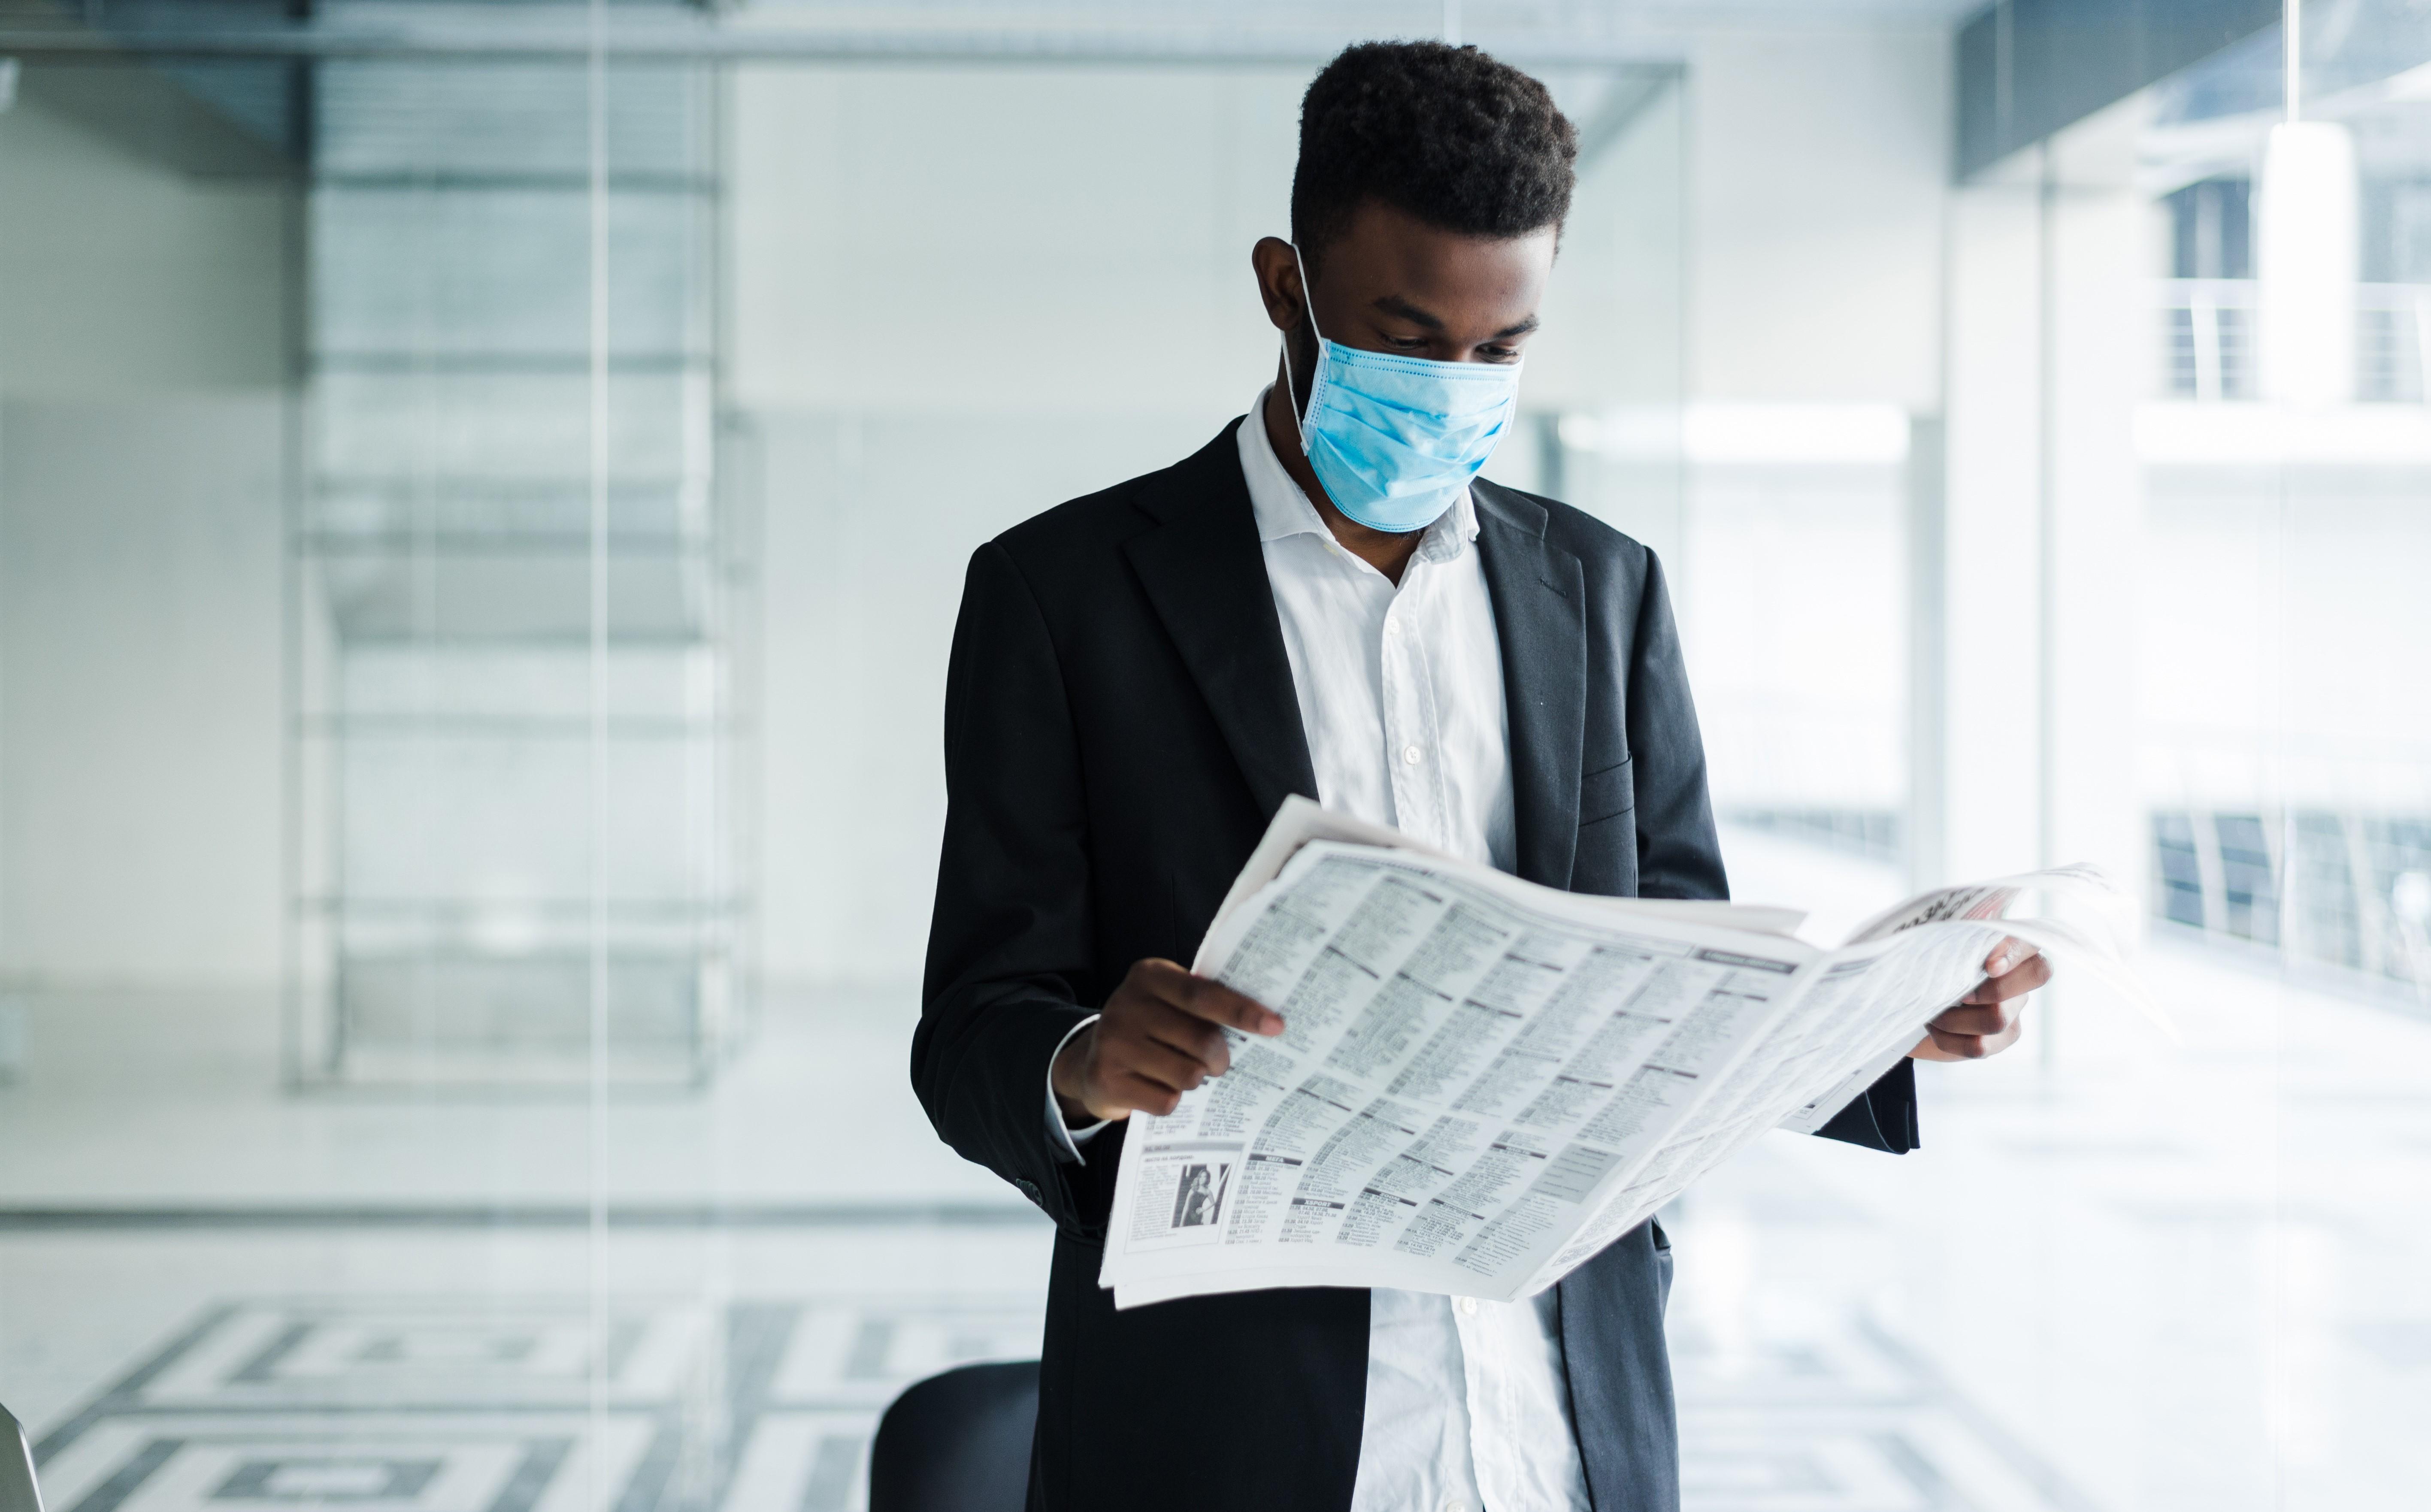 african-handsome-business-man-medical-mask-reading-newspaper-office-building-1-1